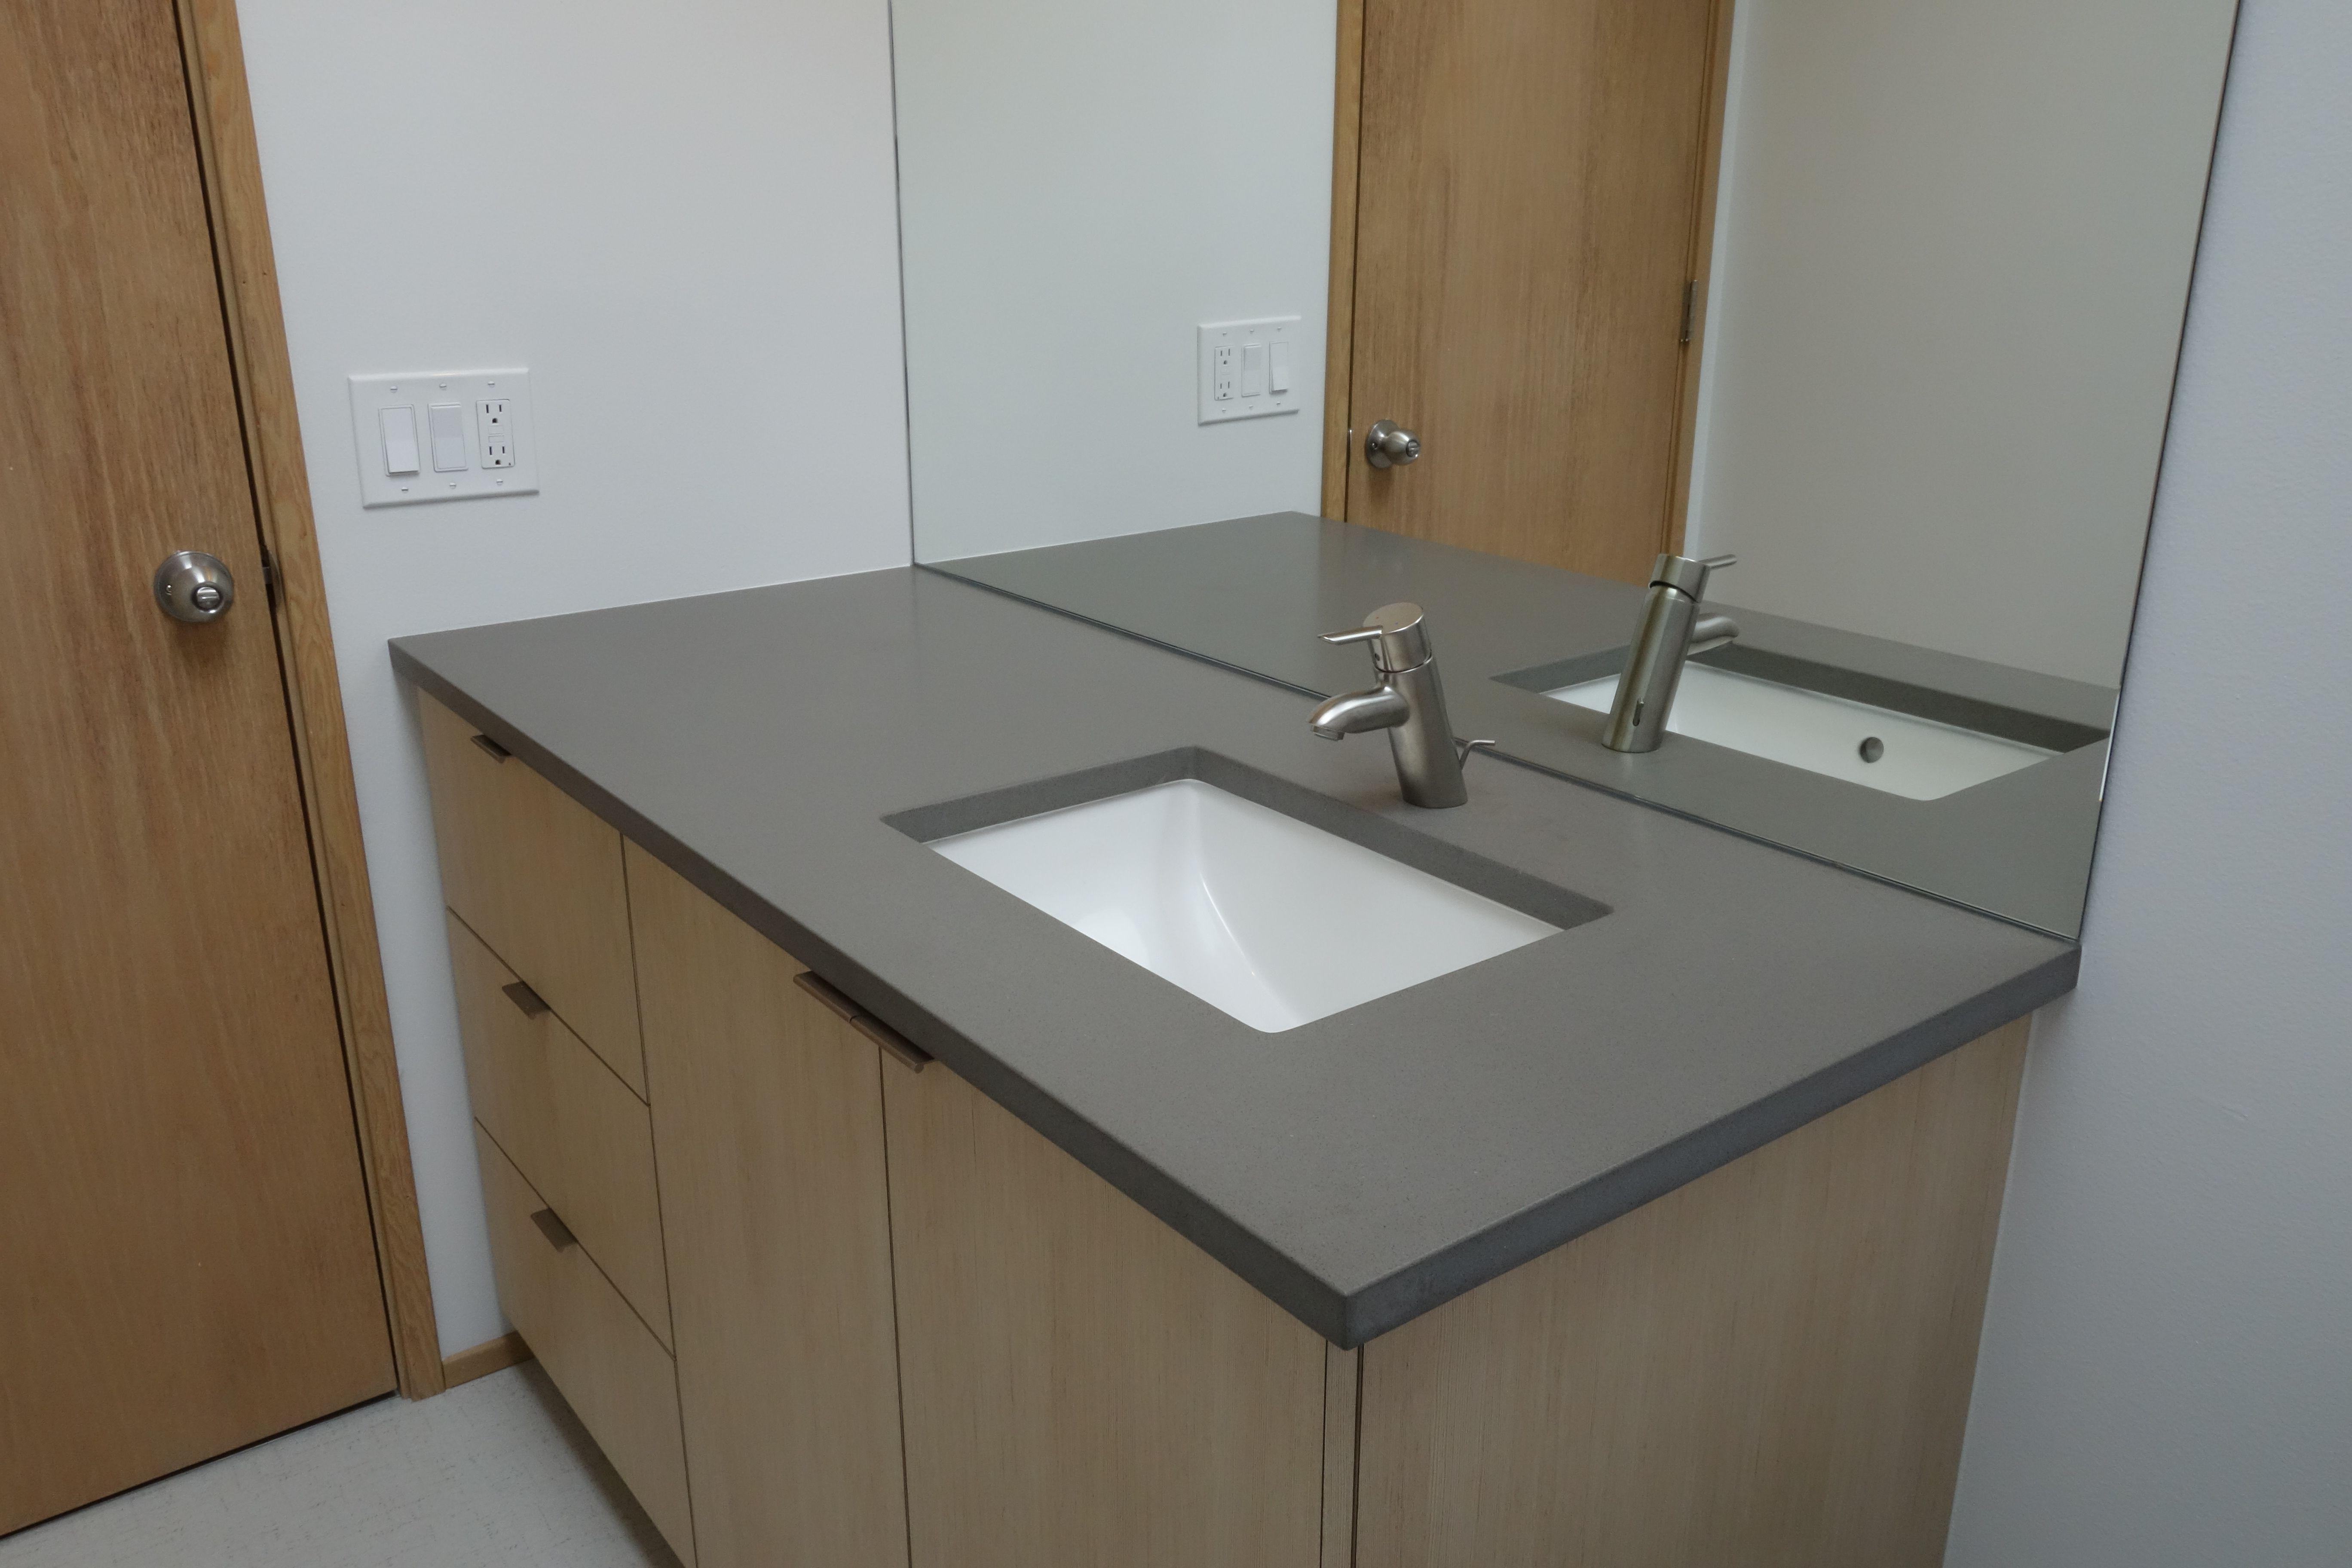 Bathroom remodel kirkland - Kirkland Bathroom Remodel